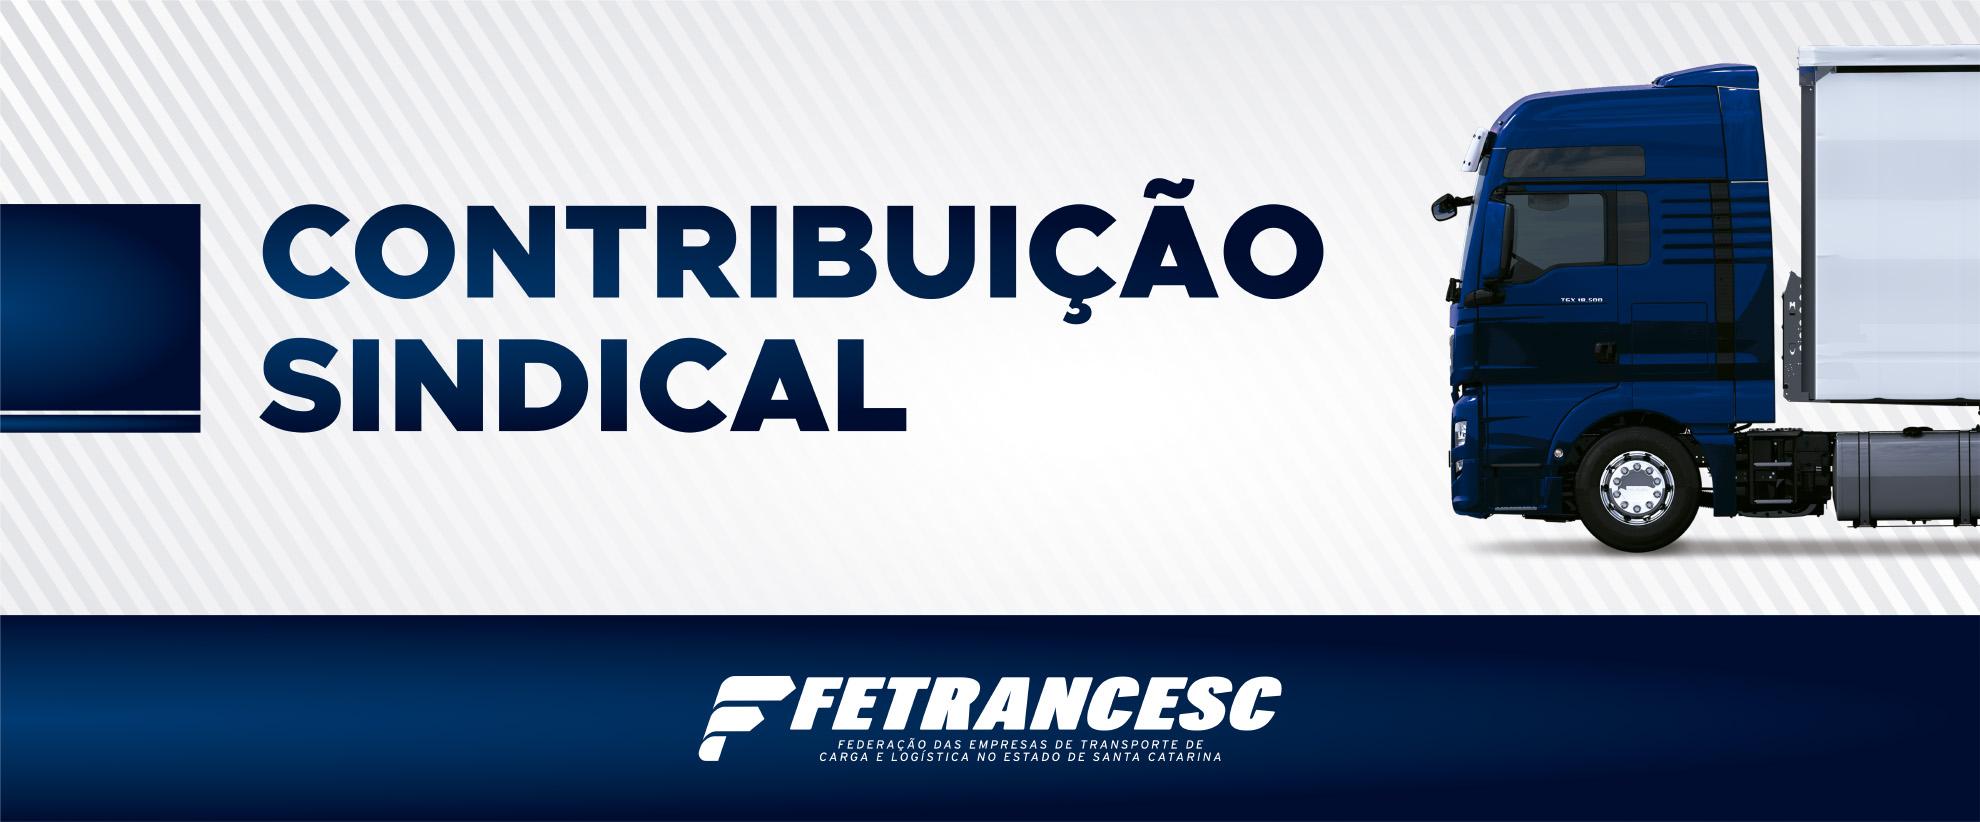 http://fetrancesc.com.br/noticia/contribuicao-sindical